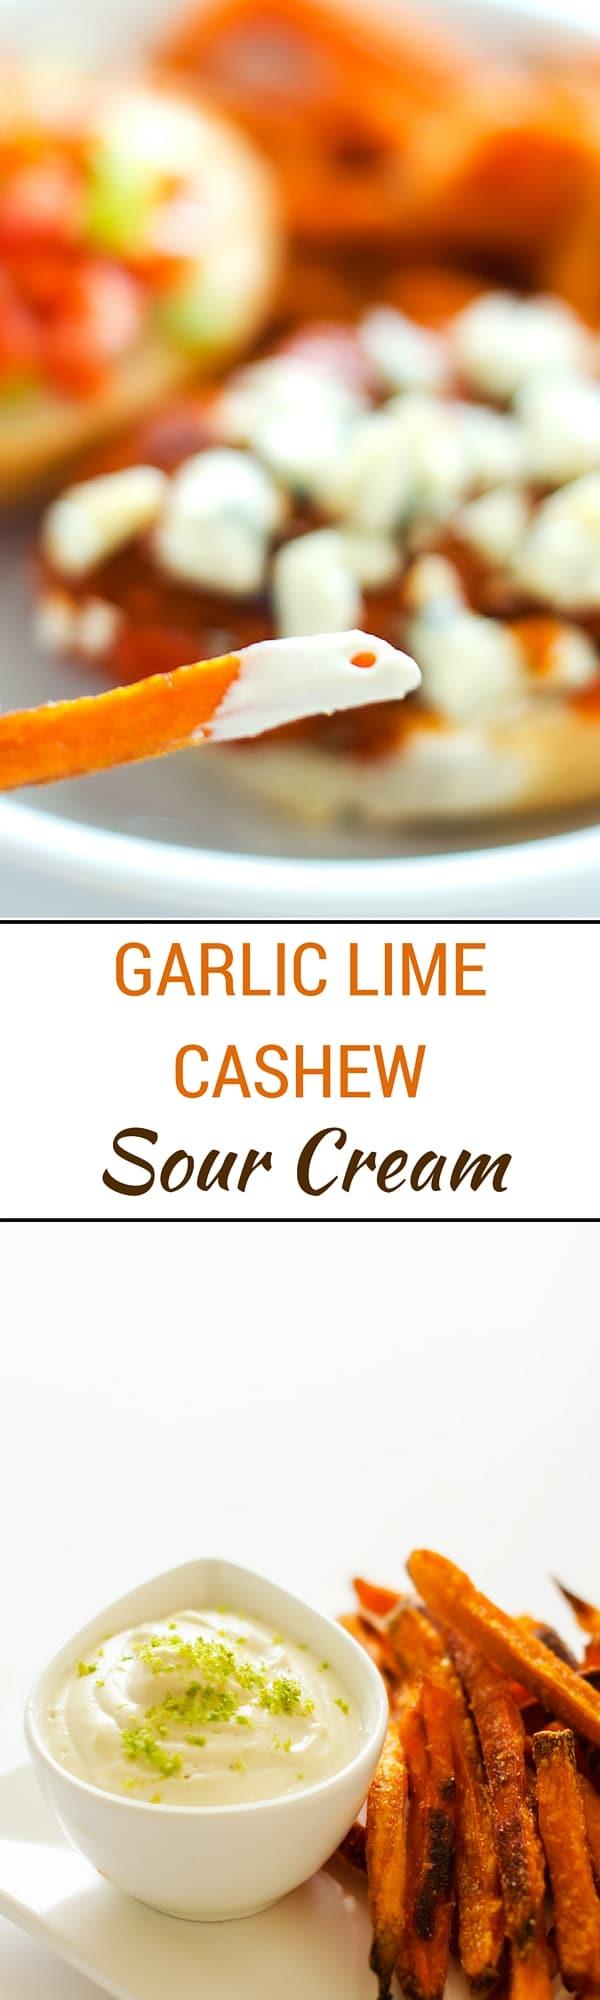 Garlic Lime Cashew Sour Cream - You won't miss the dairy in this healthier alternative to sour cream. Dairy-Free, Gluten-Free & Vegan.